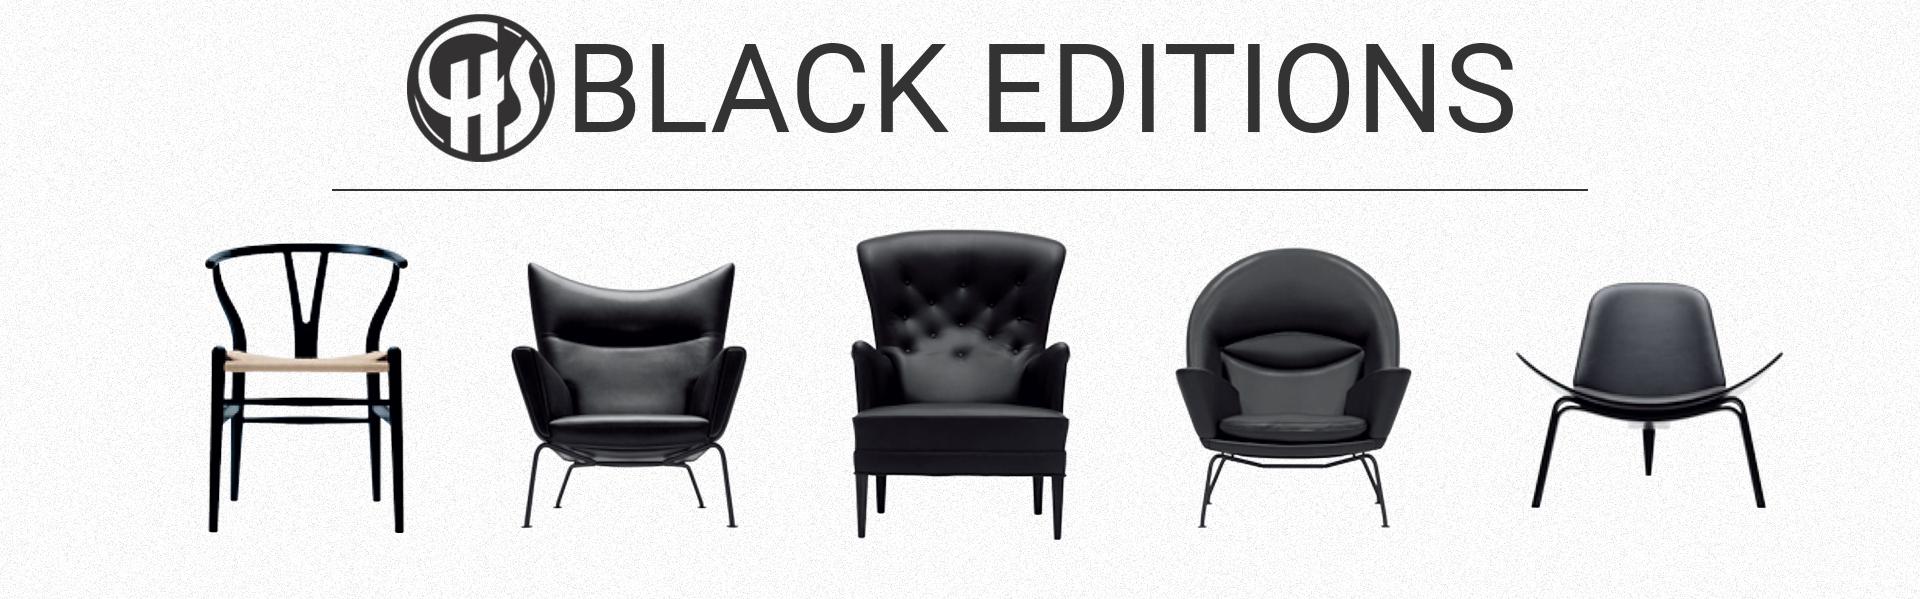 CARL HANSEN BLACK EDITION